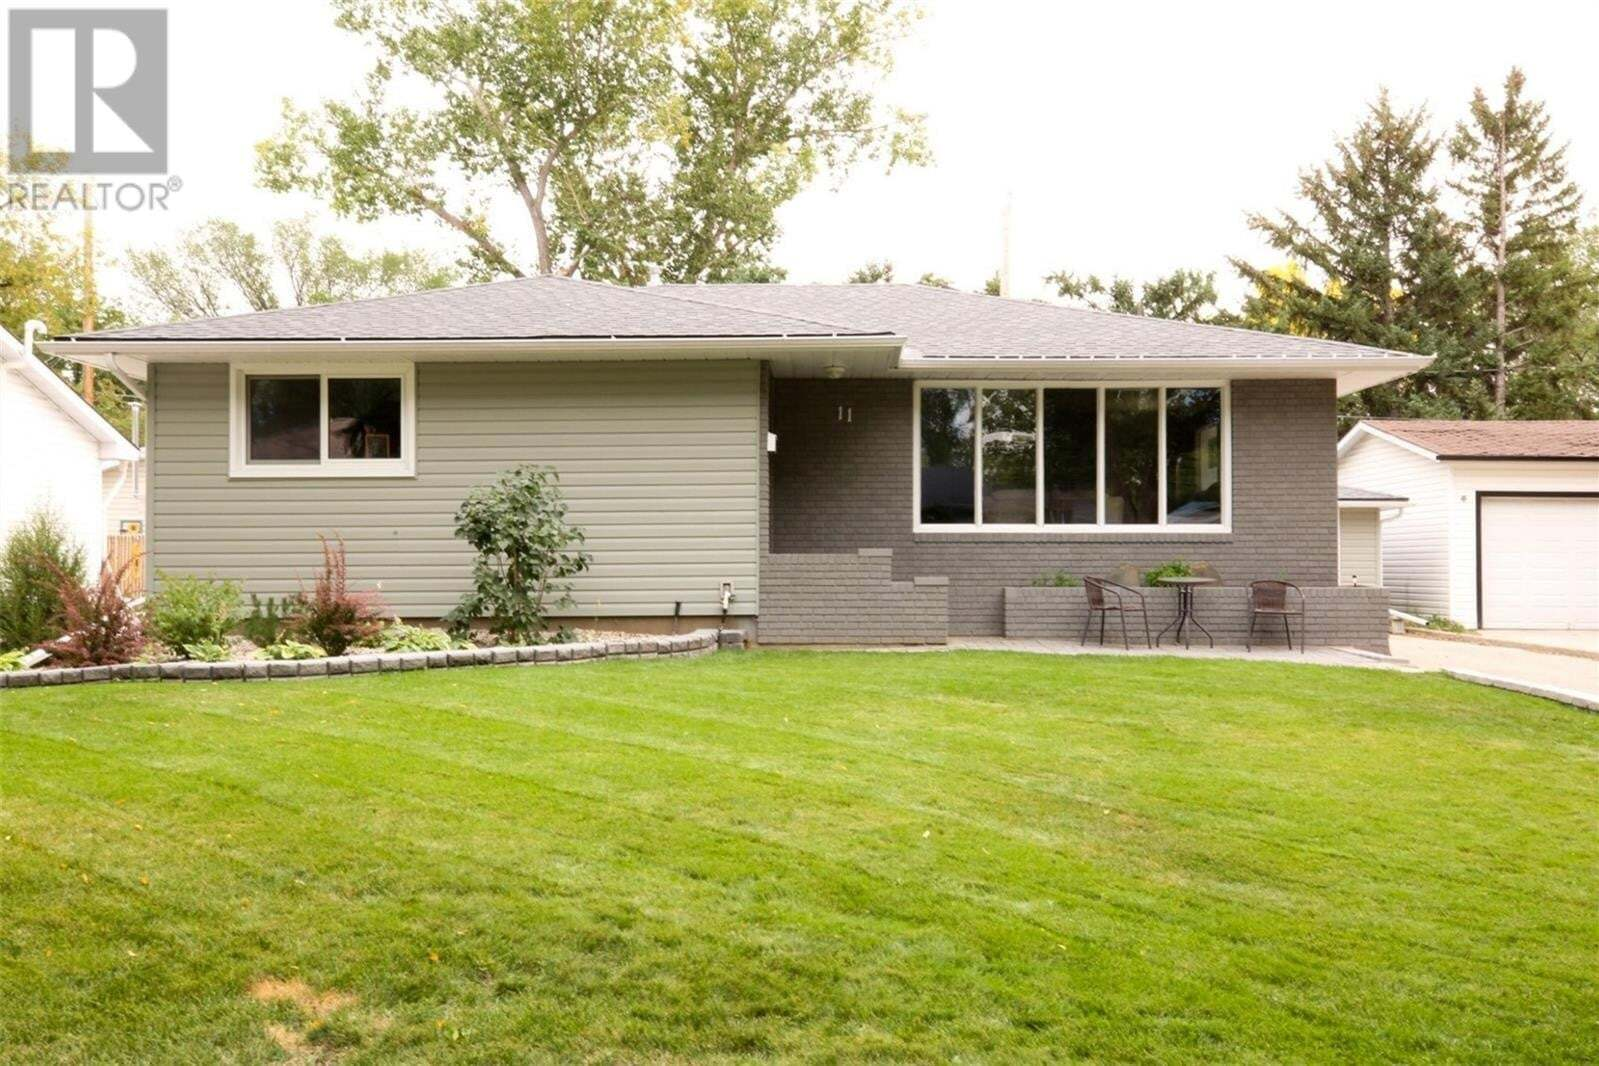 House for sale at 11 Dolphin By Regina Saskatchewan - MLS: SK826818